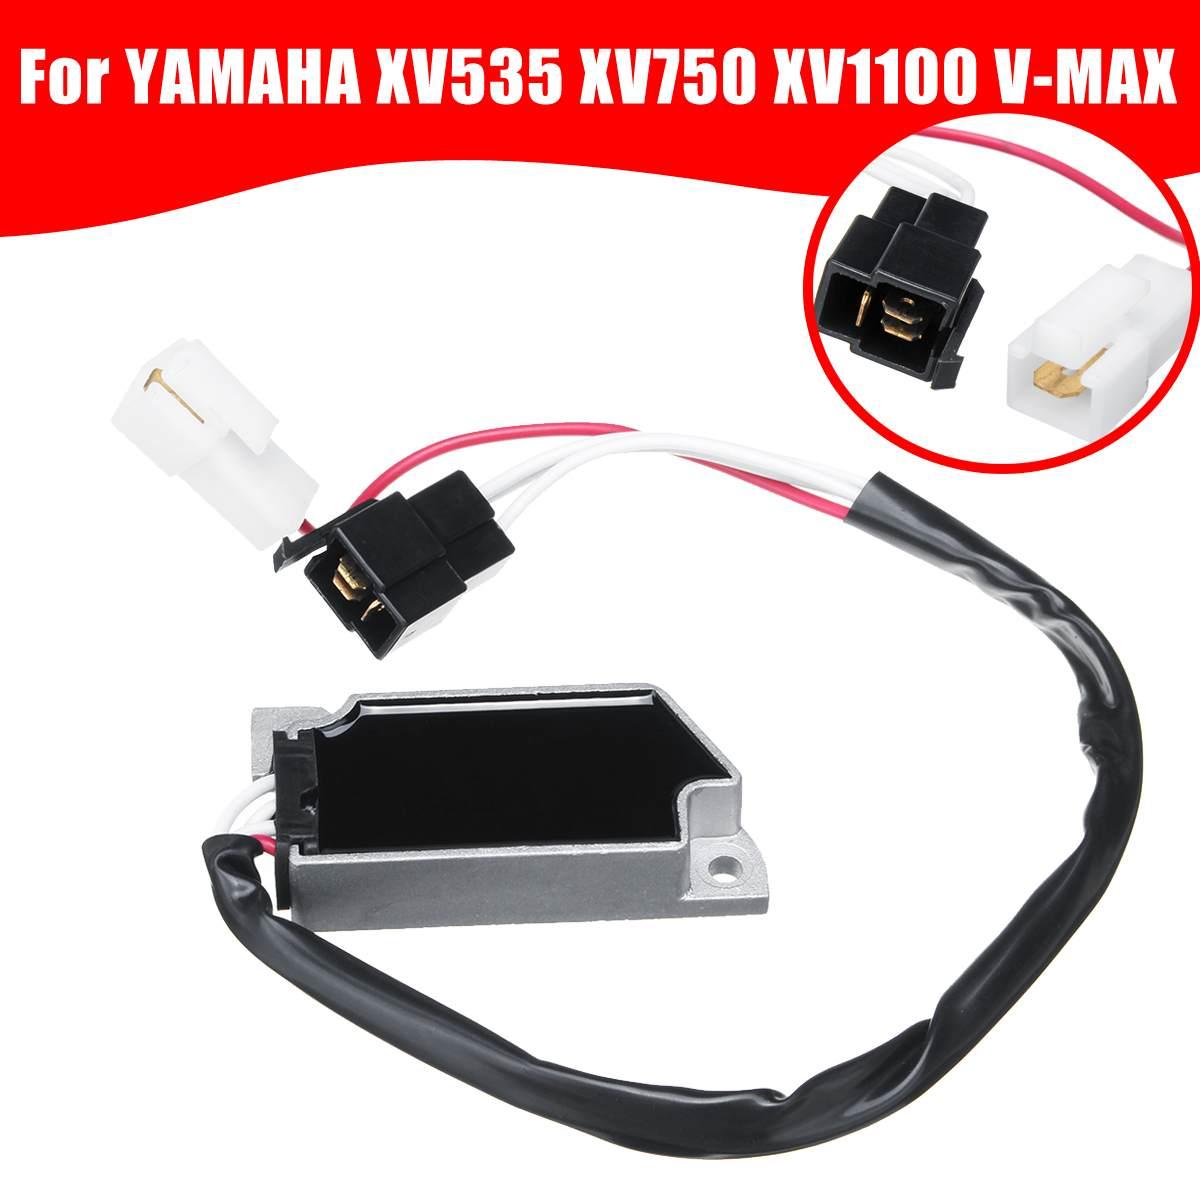 Autoleader, regulador de voltaje de motocicleta Motobike, rectificador estabilizador de Moto para YAMAHA XV535 XV750 XV1100 V-MAX